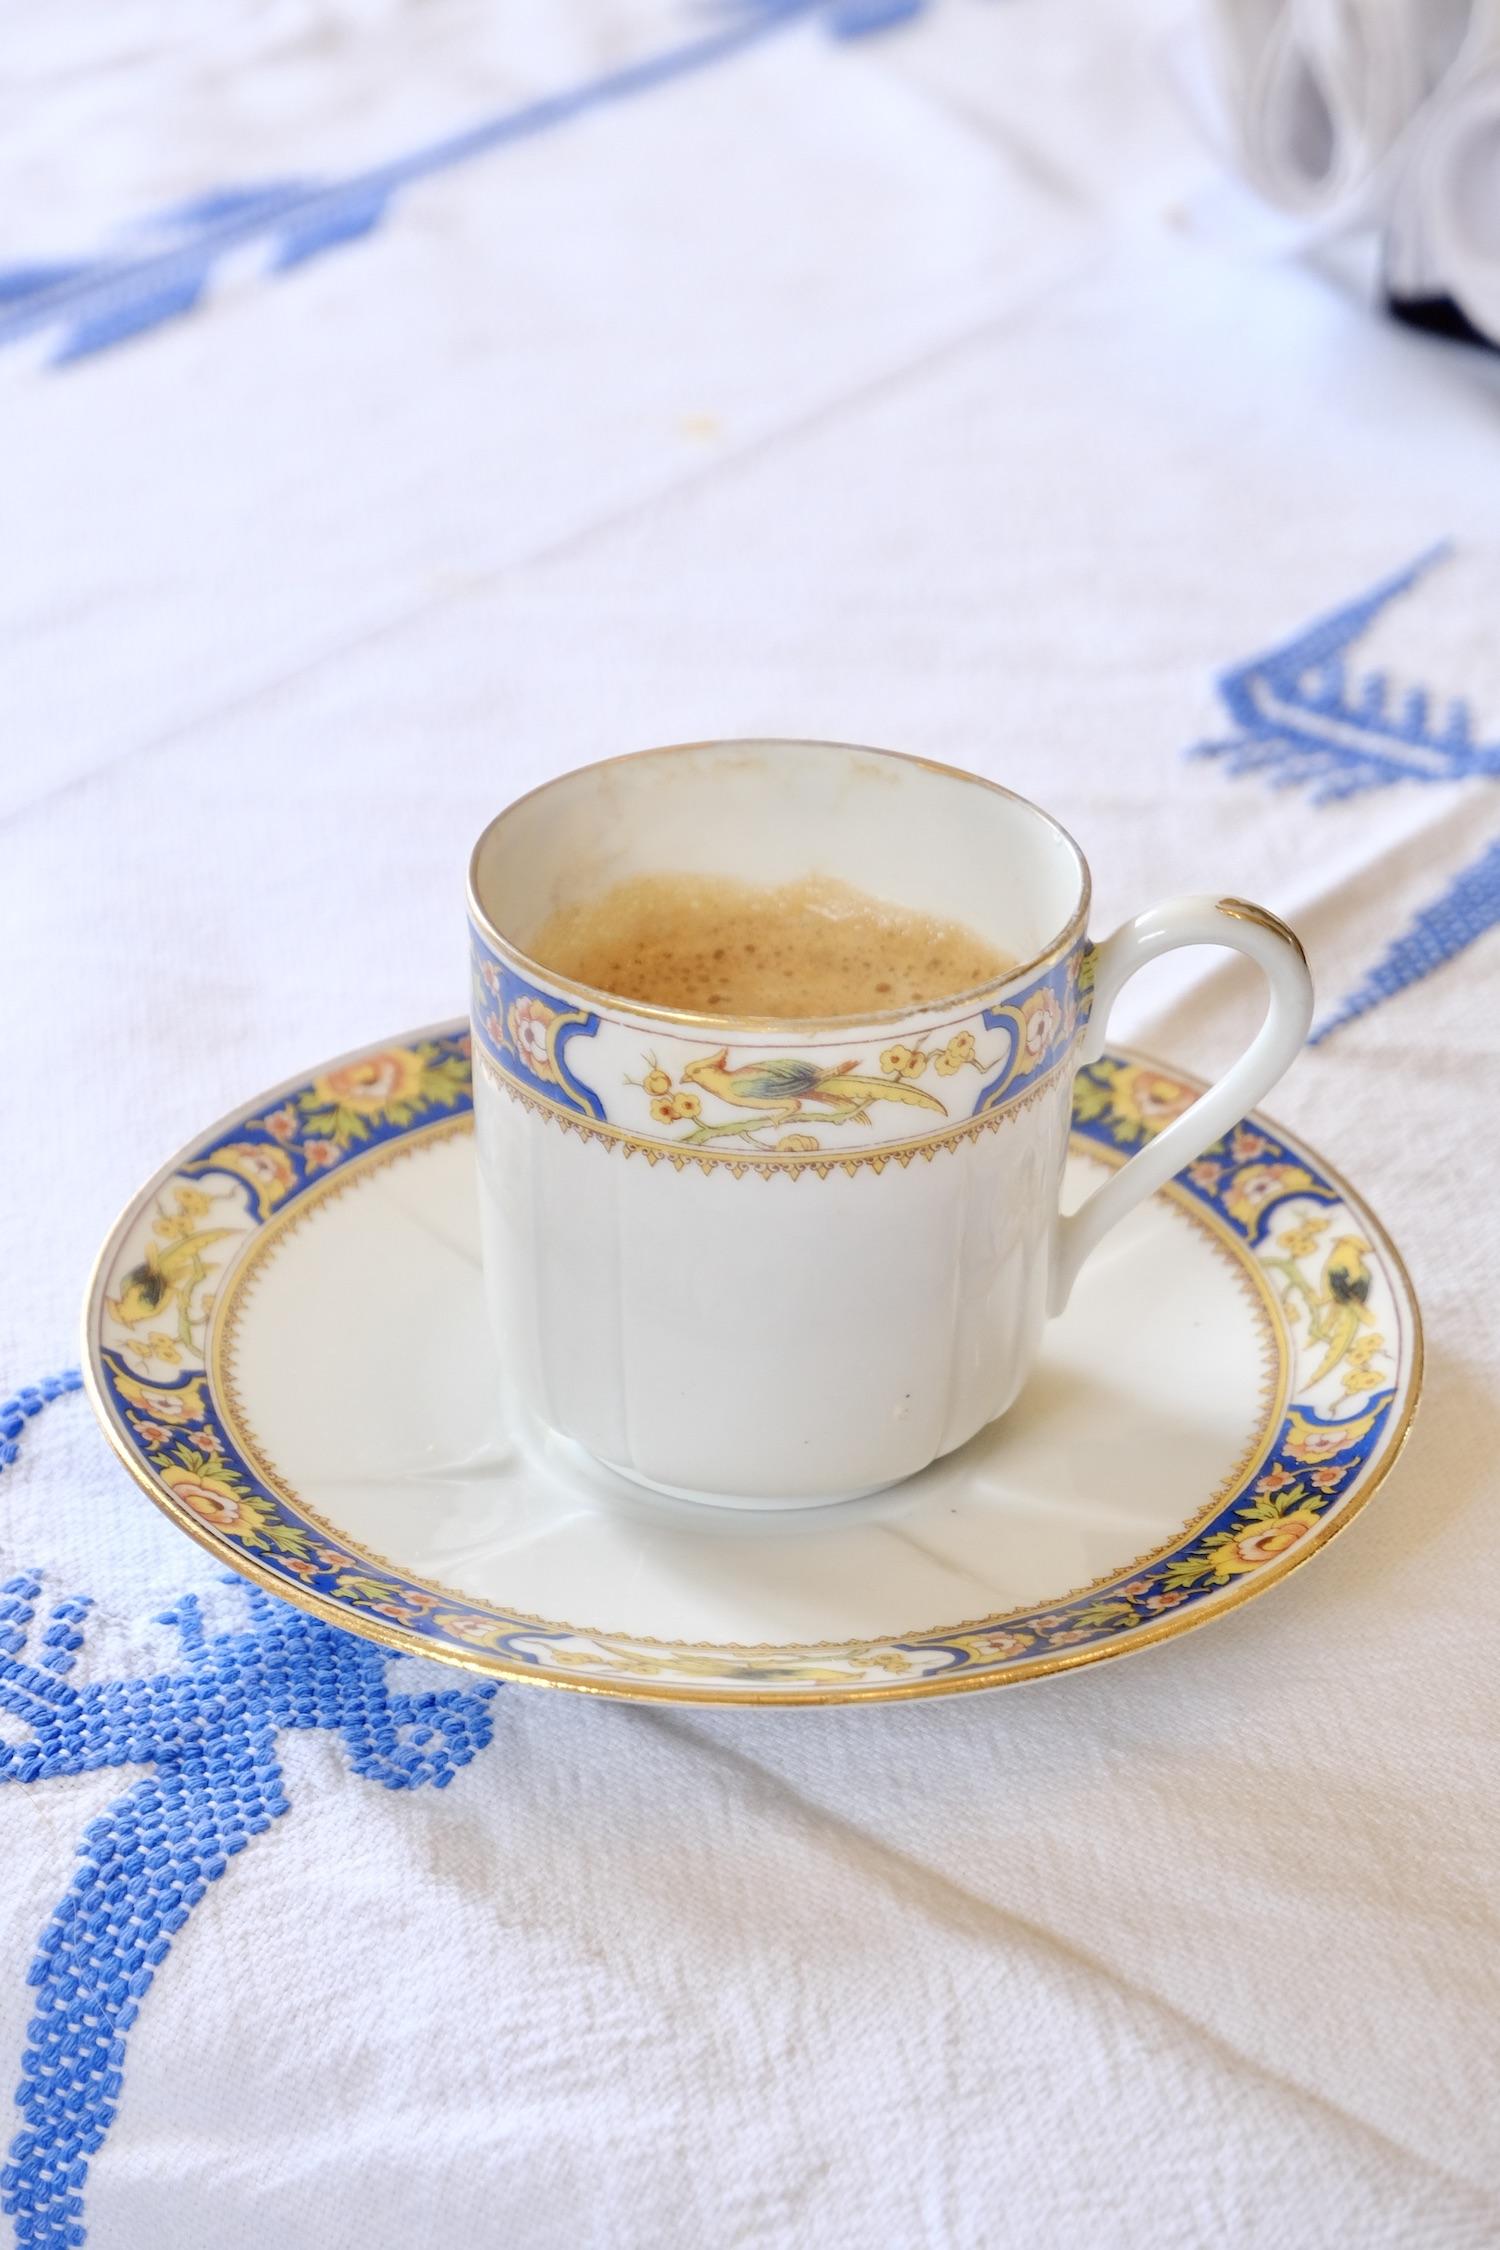 Limoges Espresso cup